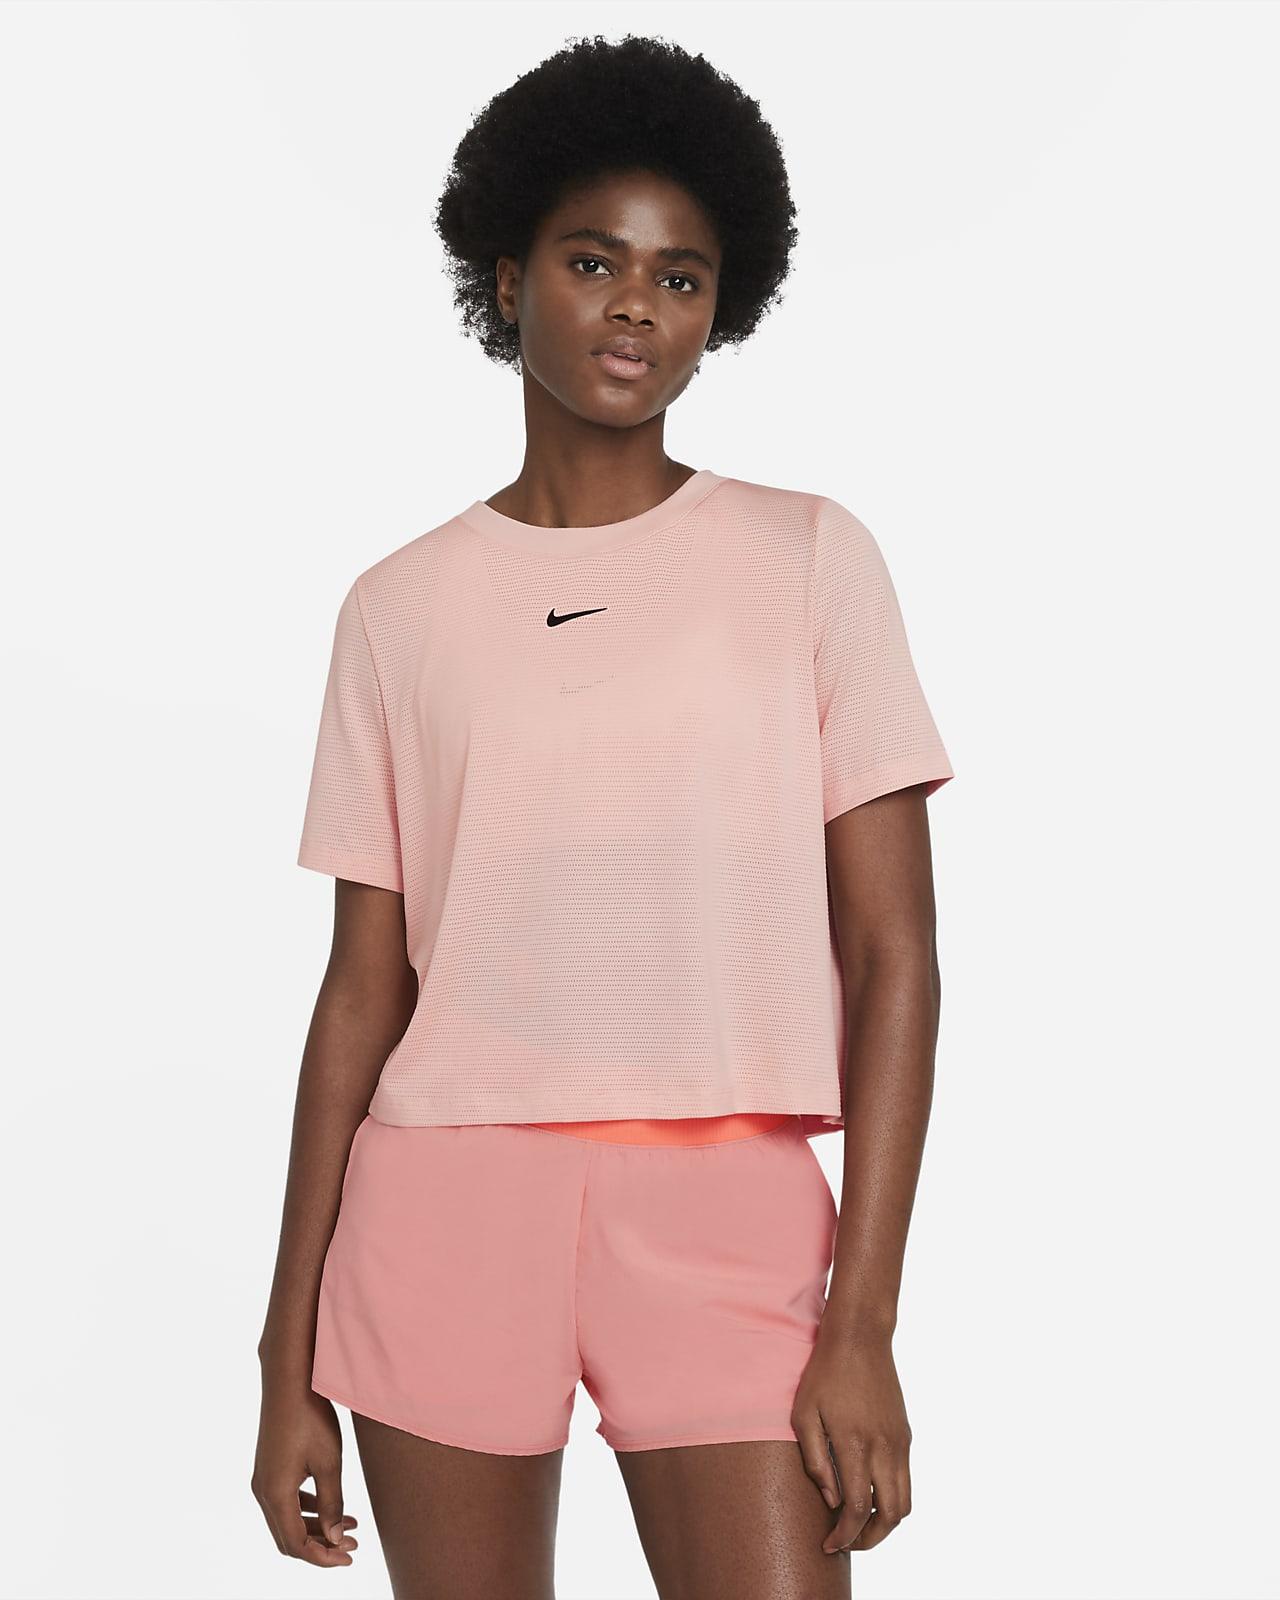 NikeCourt Advantage Women's Short-Sleeve Tennis Top